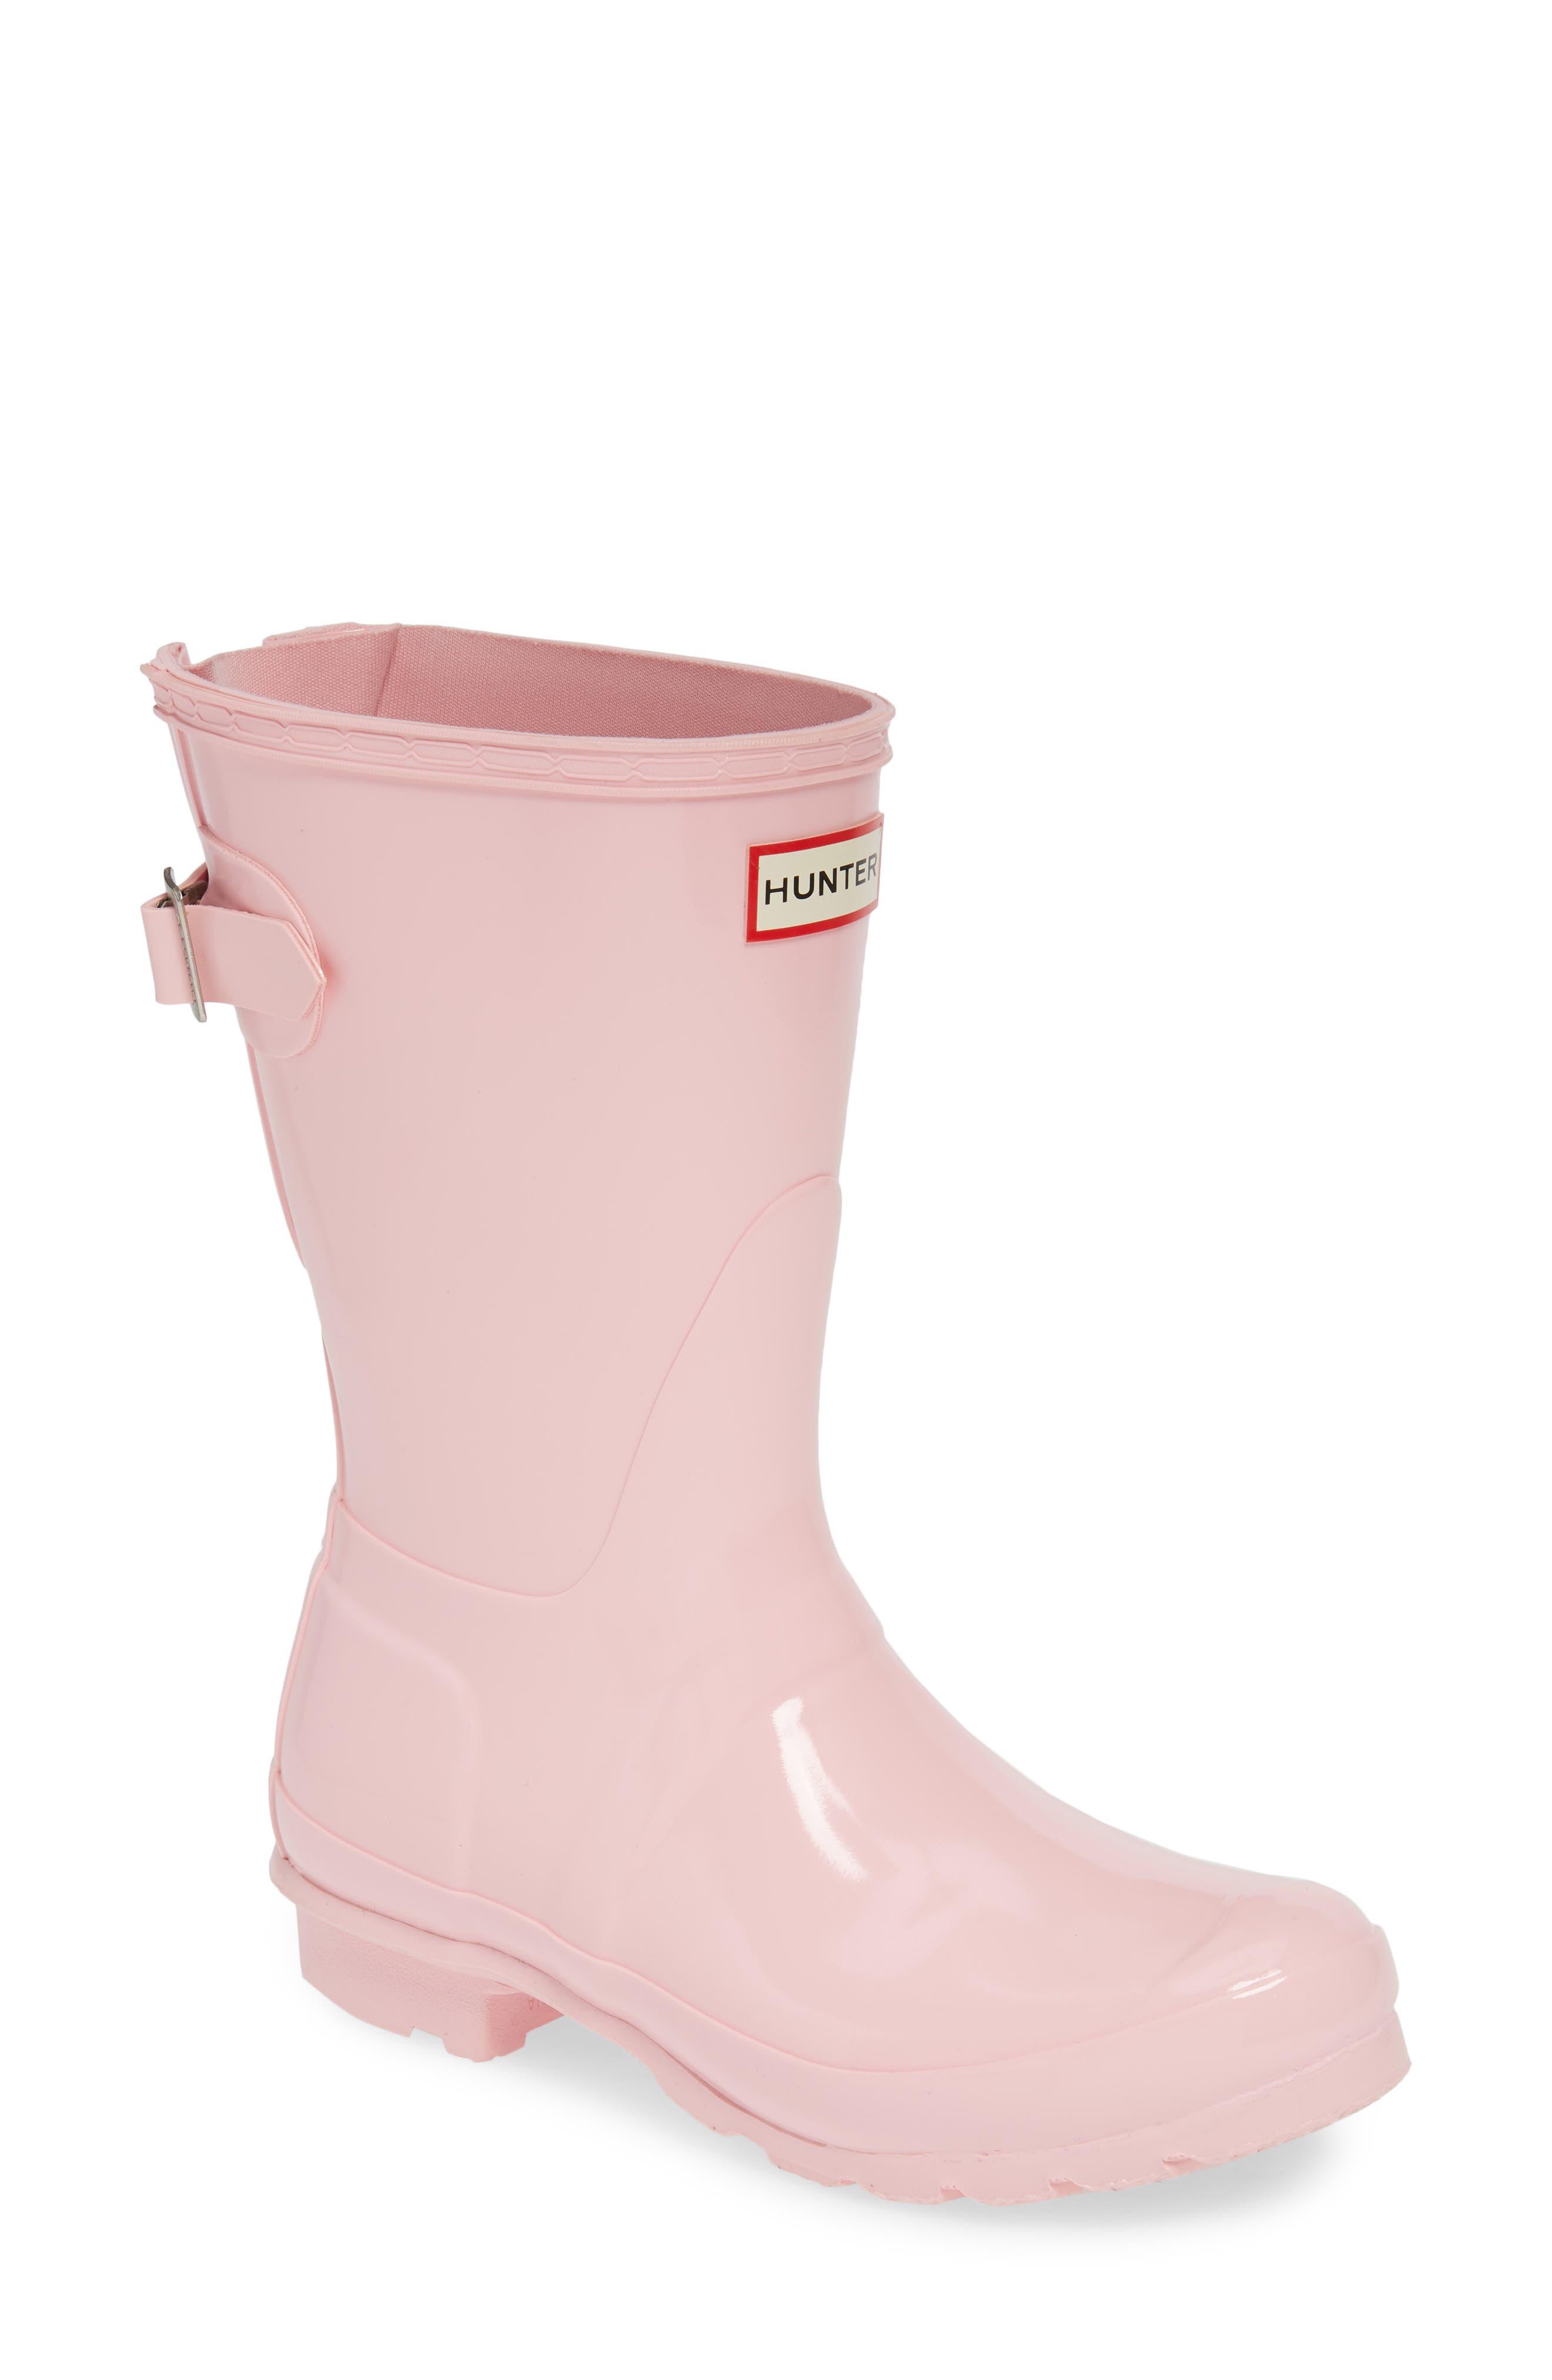 HUNTER Original Short Adjustable Back Gloss Waterproof Rain Boot, Main, color, CANDY FLOSS RUBBER